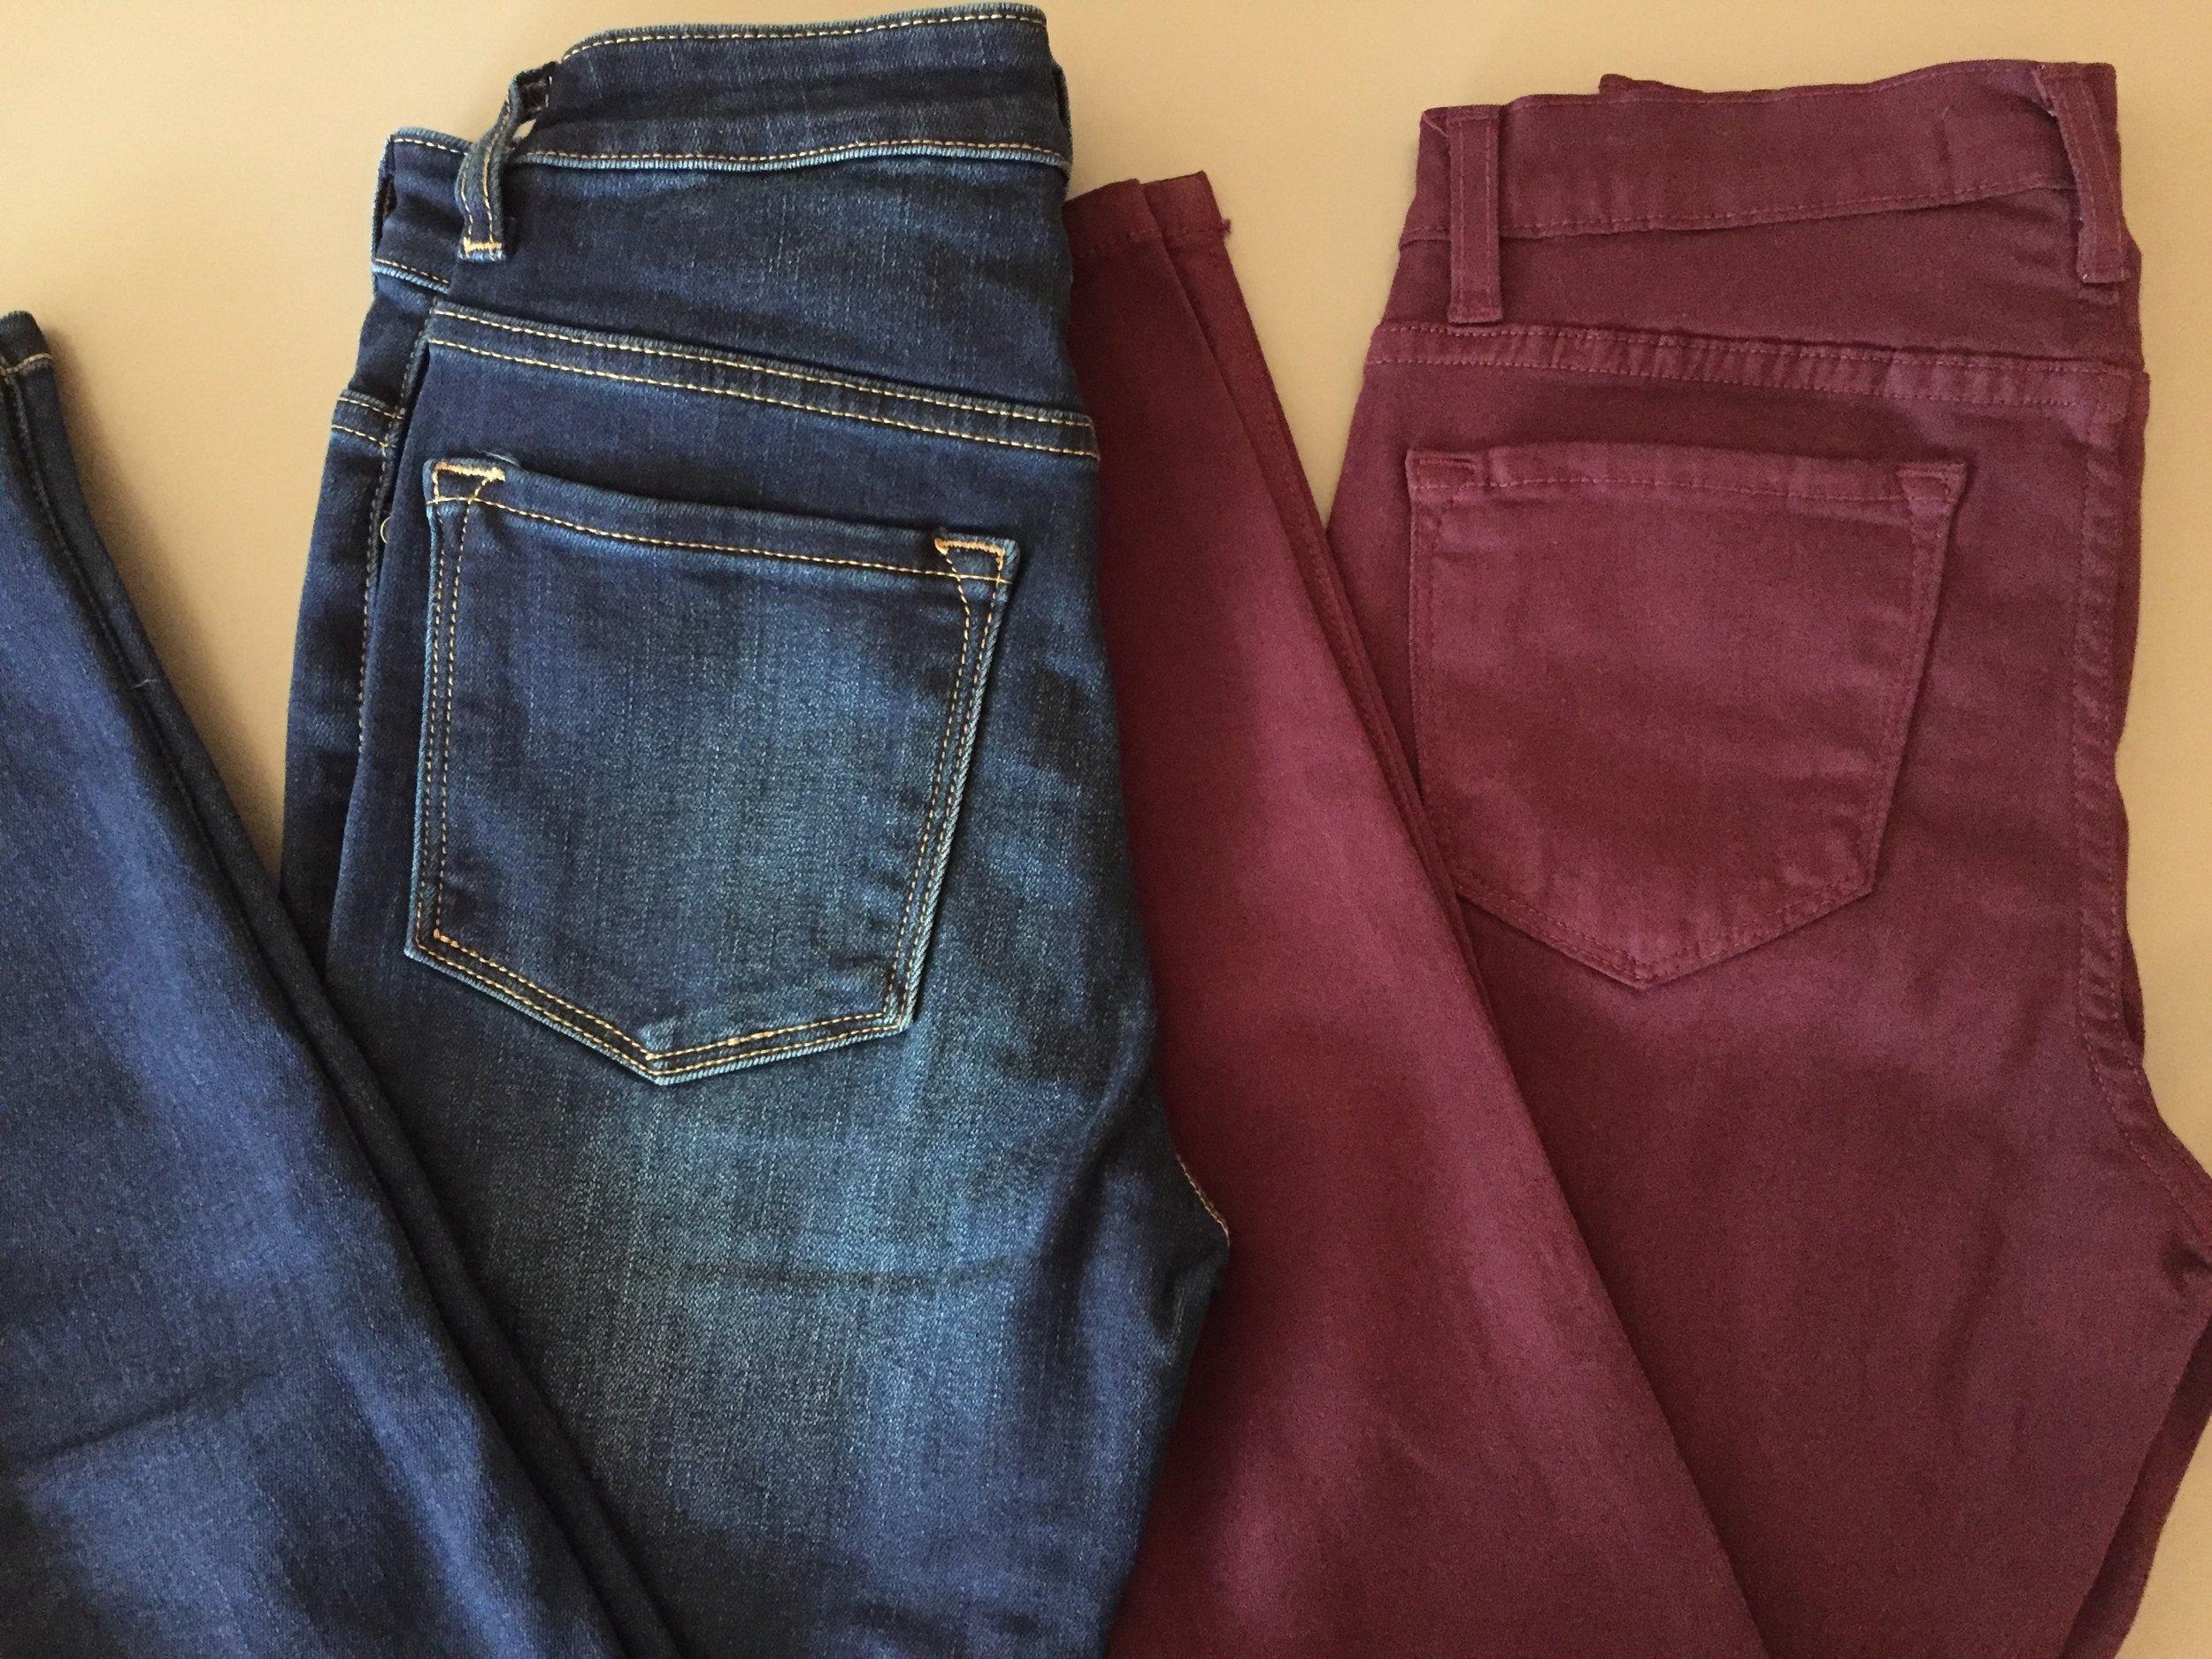 Kancan Highwaisted Jeans ($52 dark denim and burgundy)